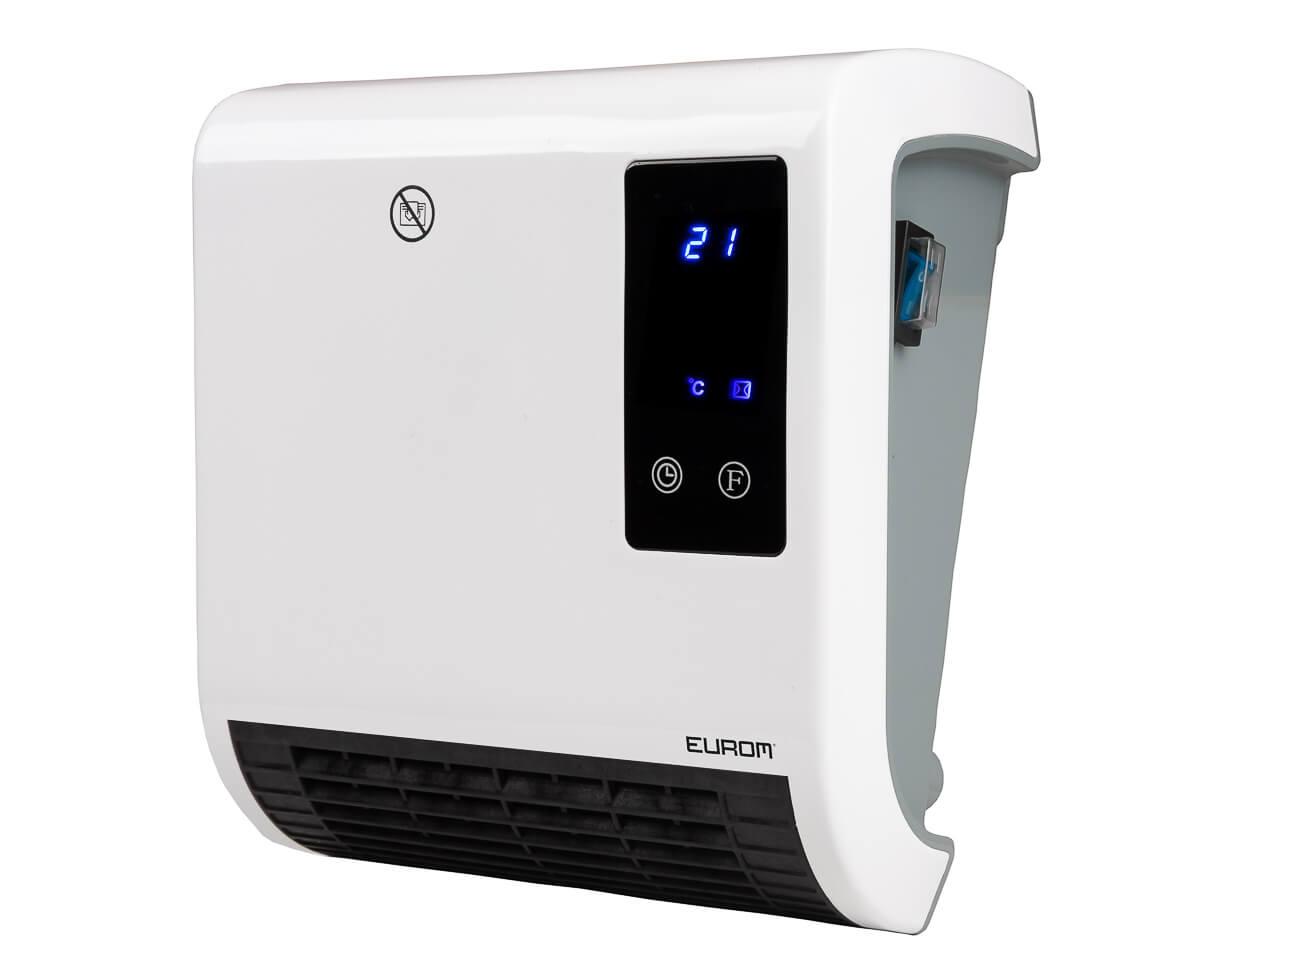 Eurom Sani-Fanheat 2000R Elektrische verwarming 2000W | Badkamerverwarming met Afstandsbediening